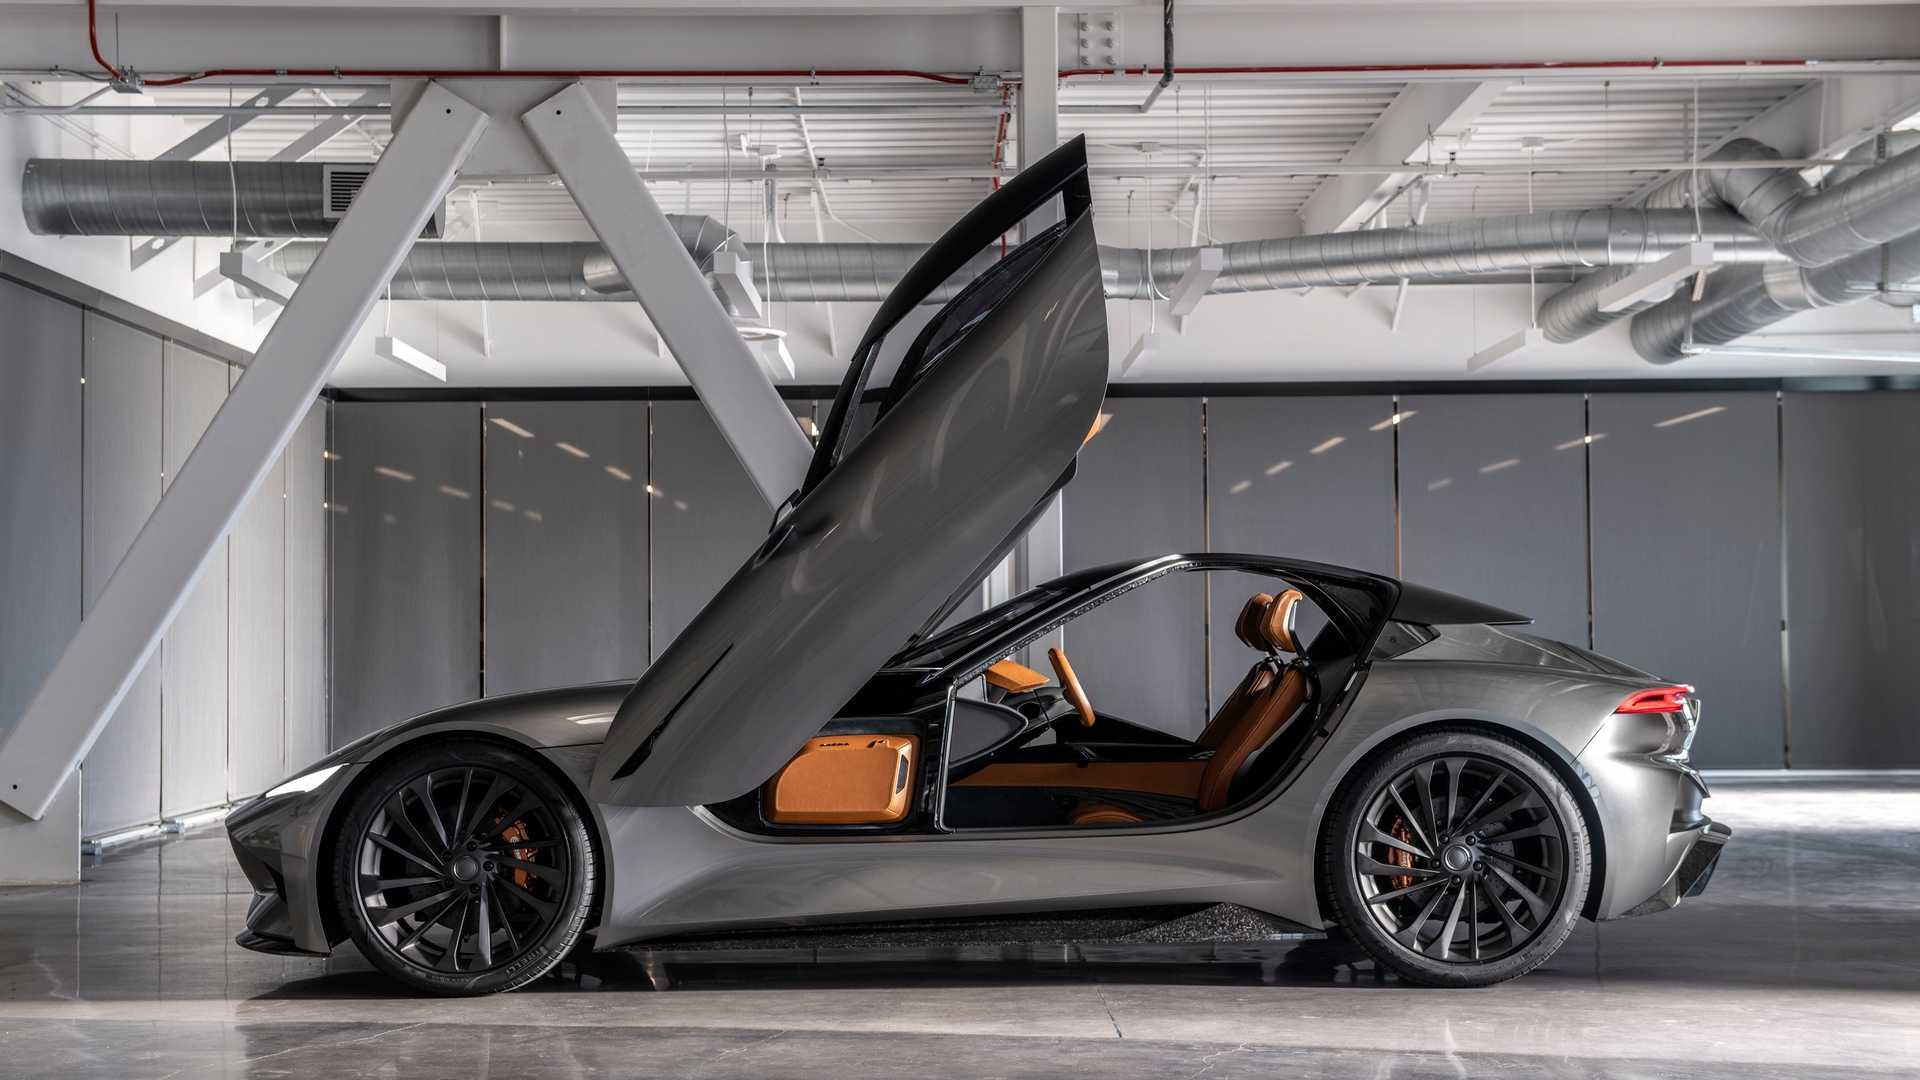 2021 Aston Martin Dbx 2020 Audi E Tron Sportback Karma Sc2 Today S Car News